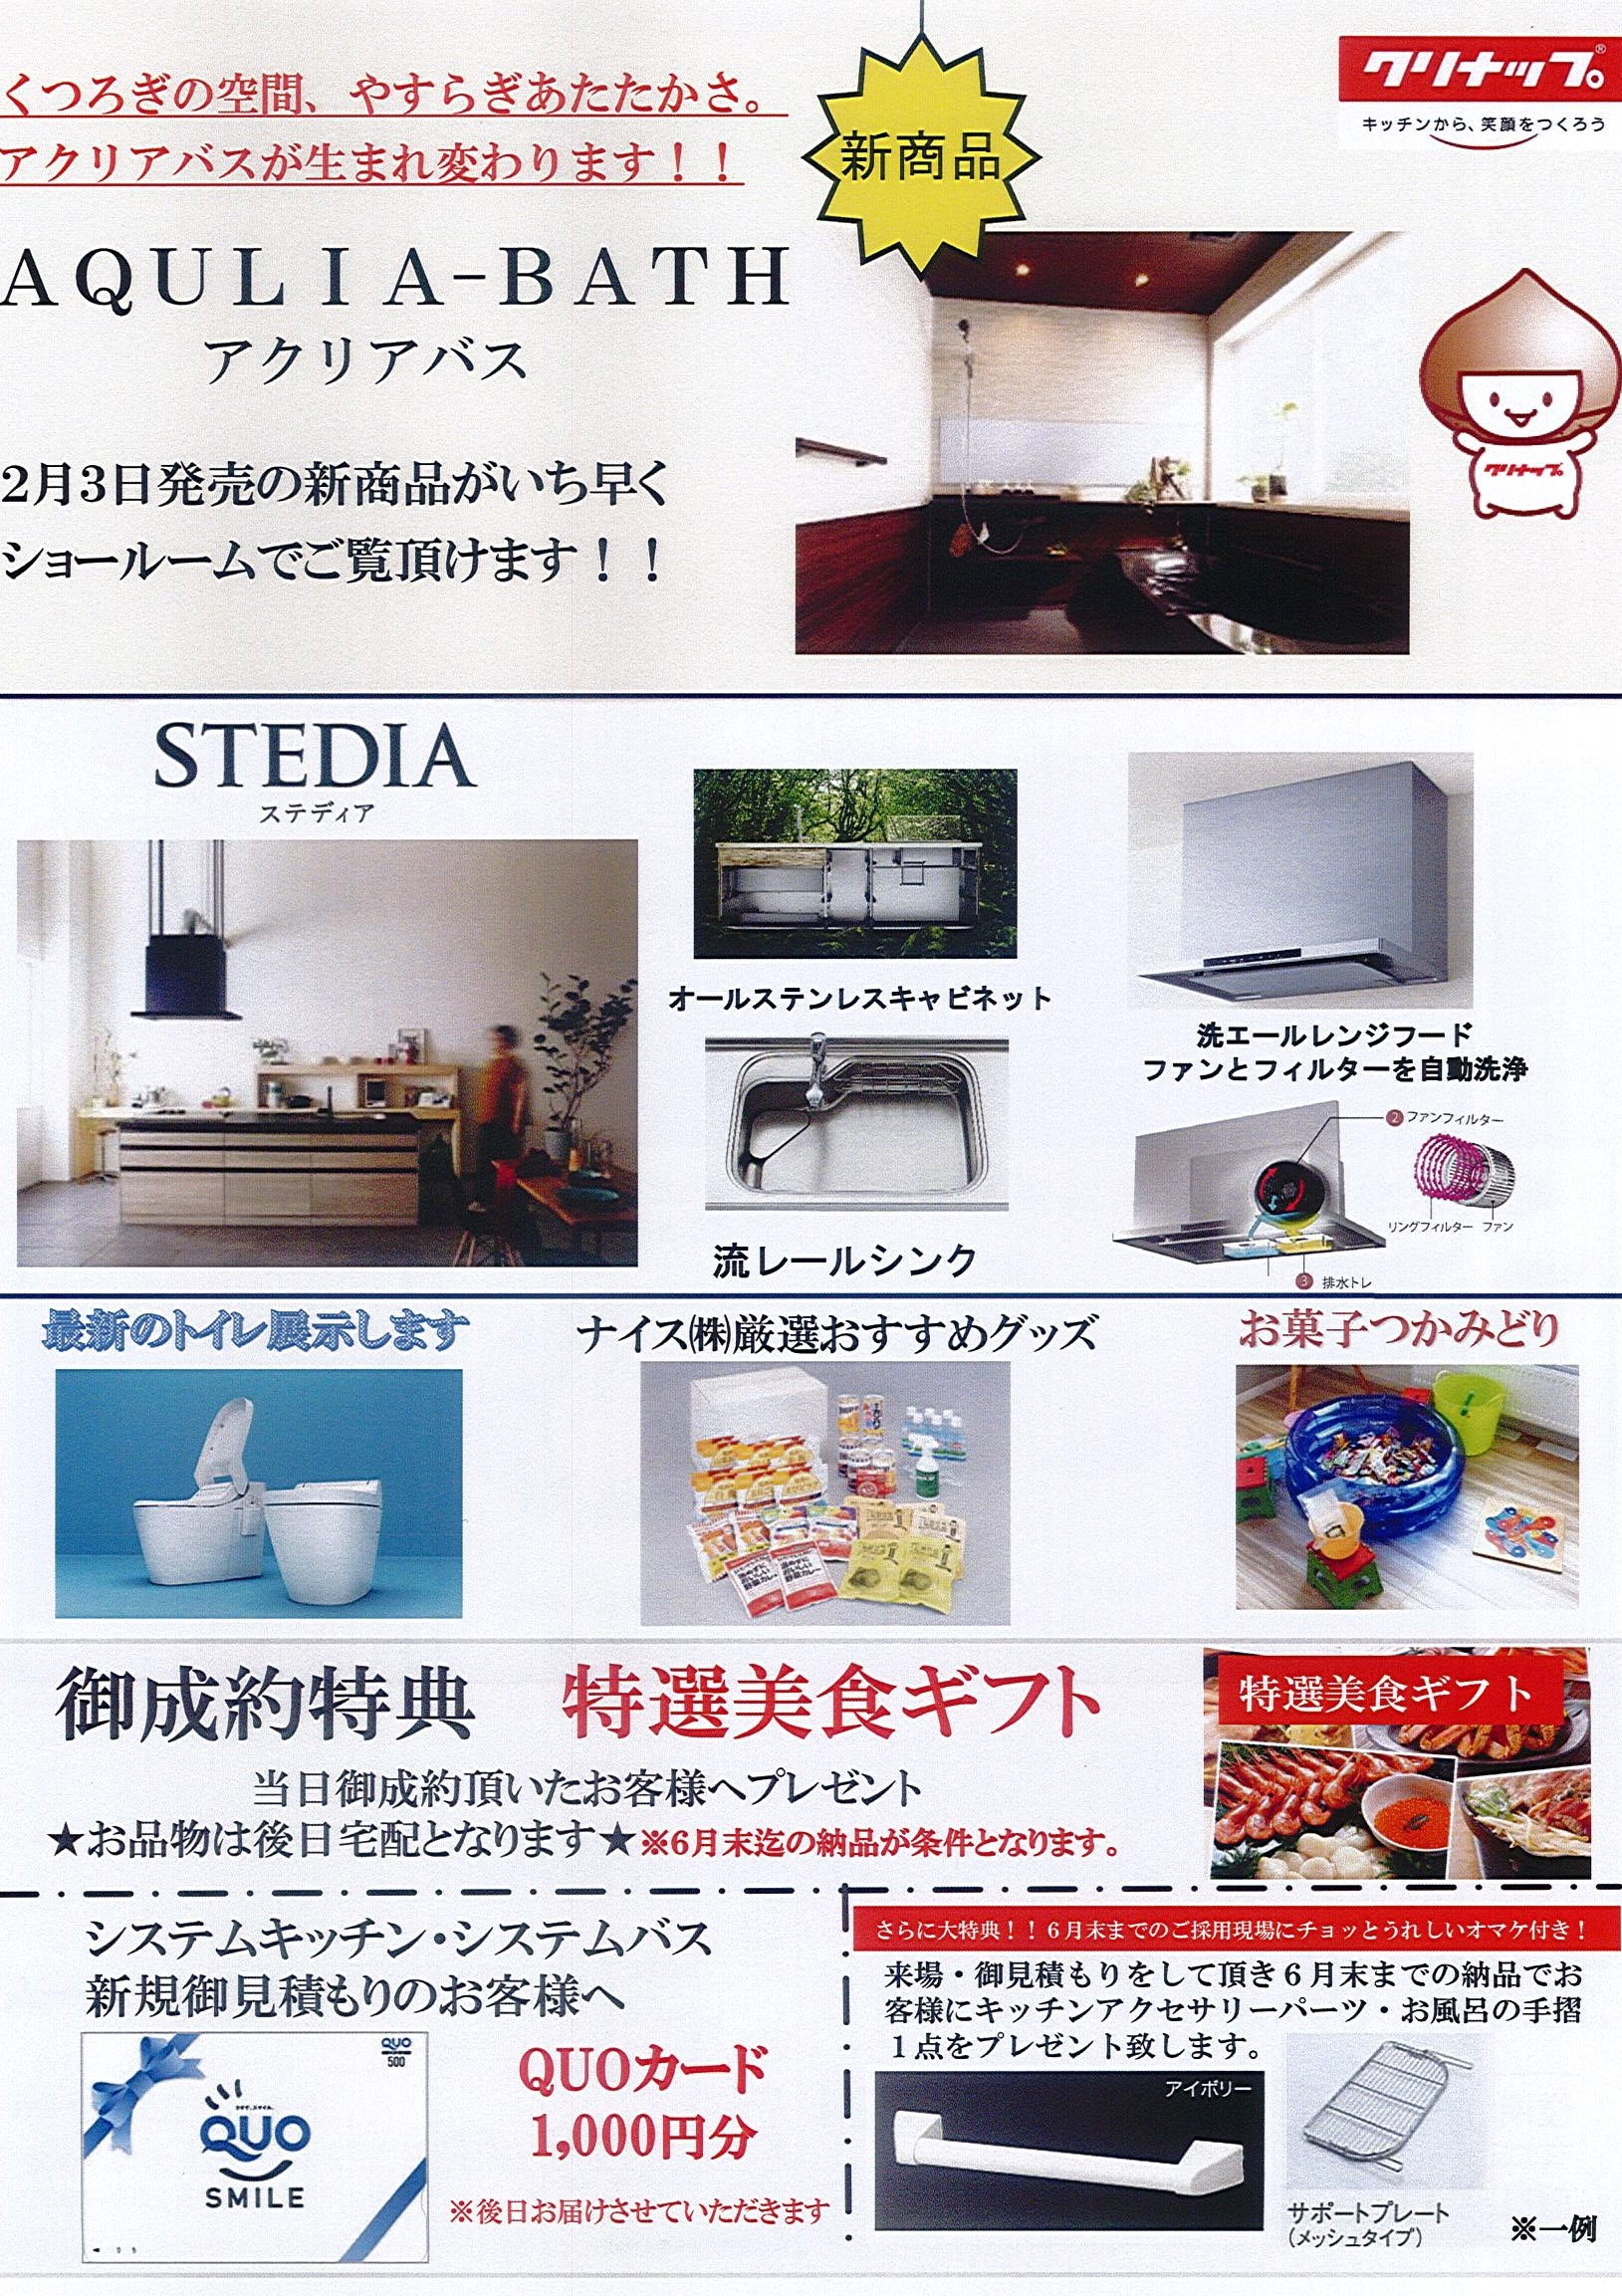 http://www.harayama-koumuten.jp/DOC200122-20200122103121.jpg